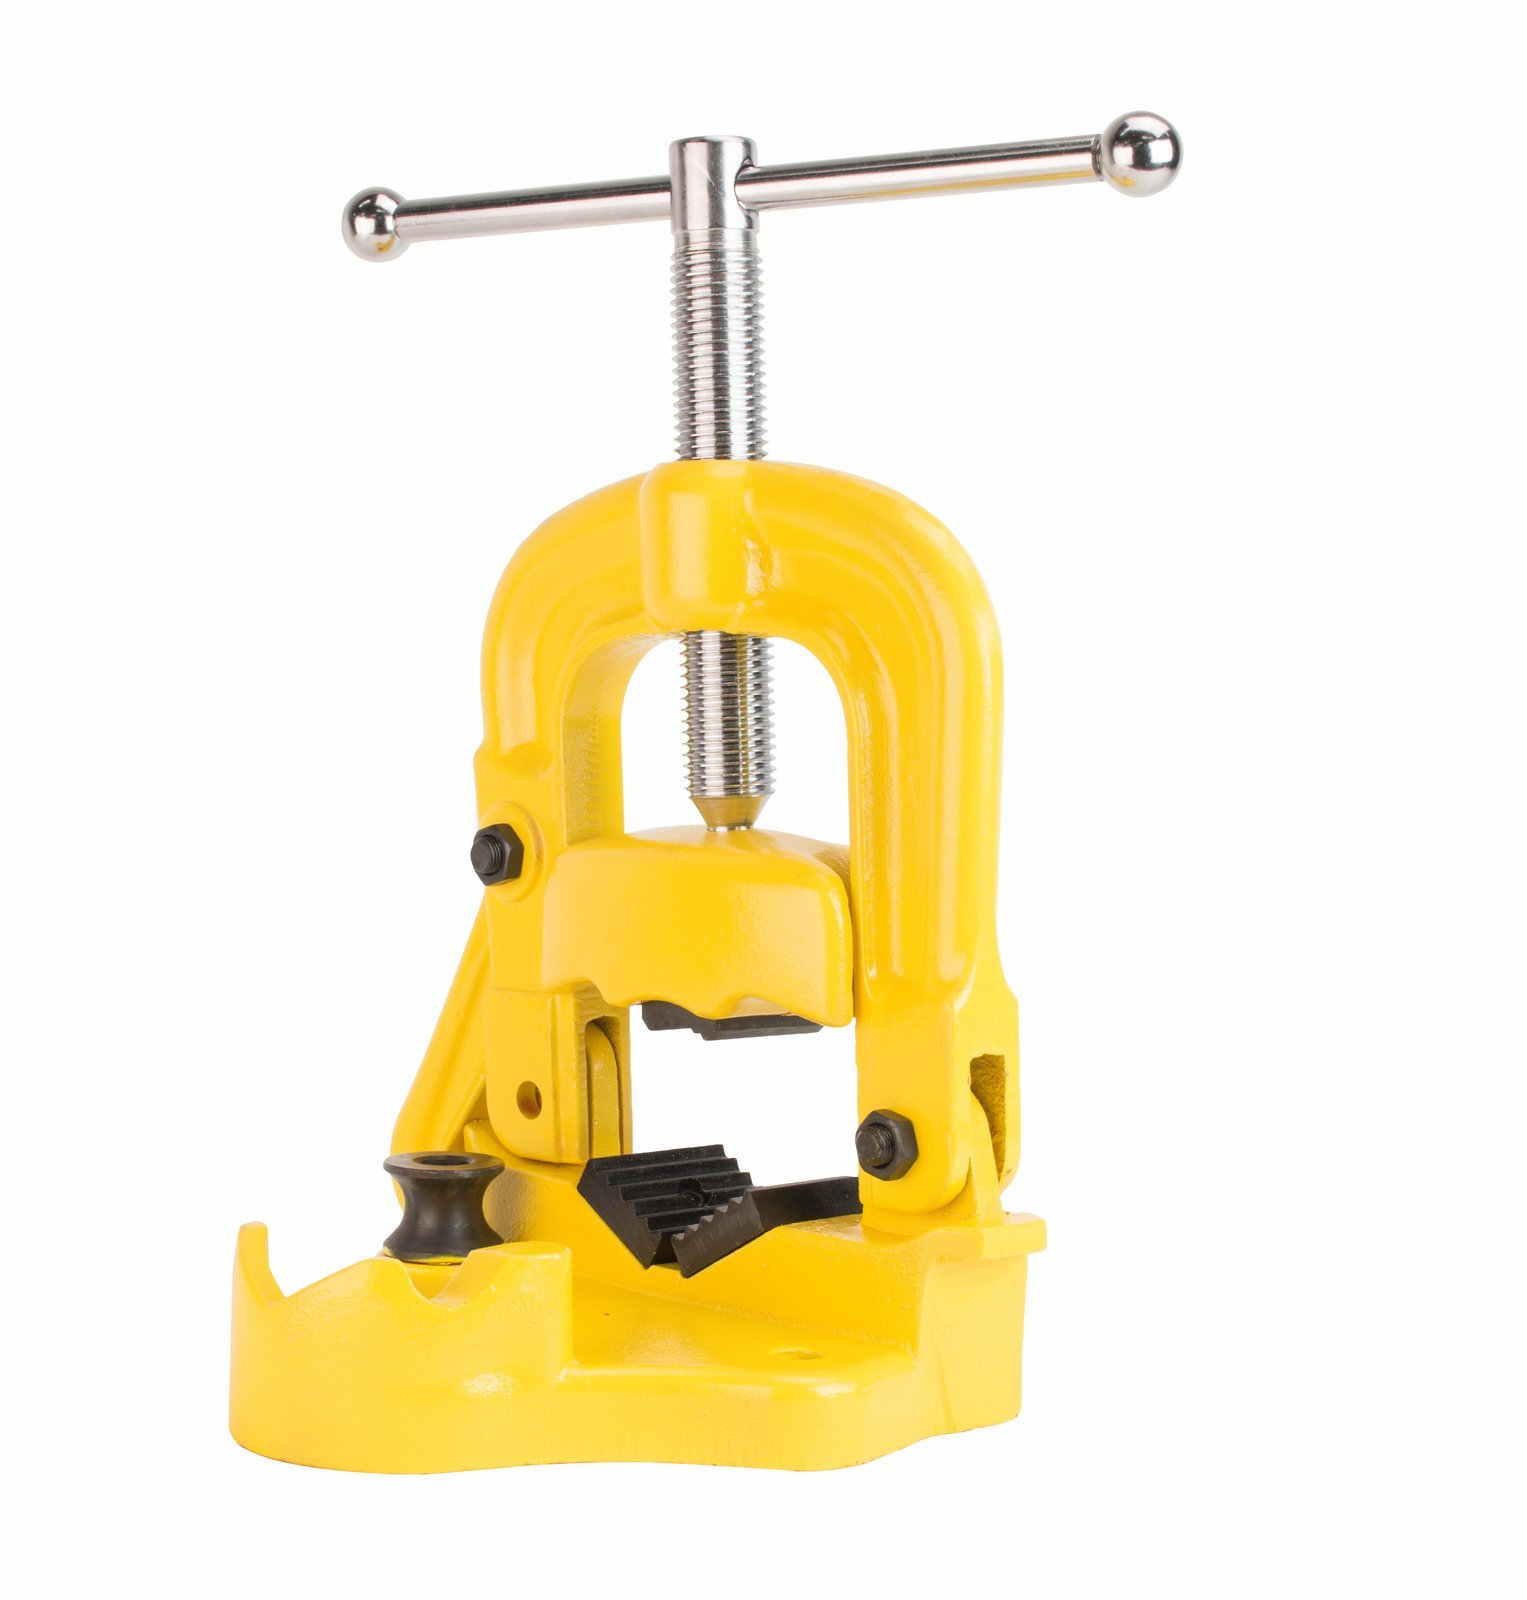 Steel Dragon Tools 40100 1/8''- 4'' Bench Yoke Pipe Vise fits RIDGID Model 25